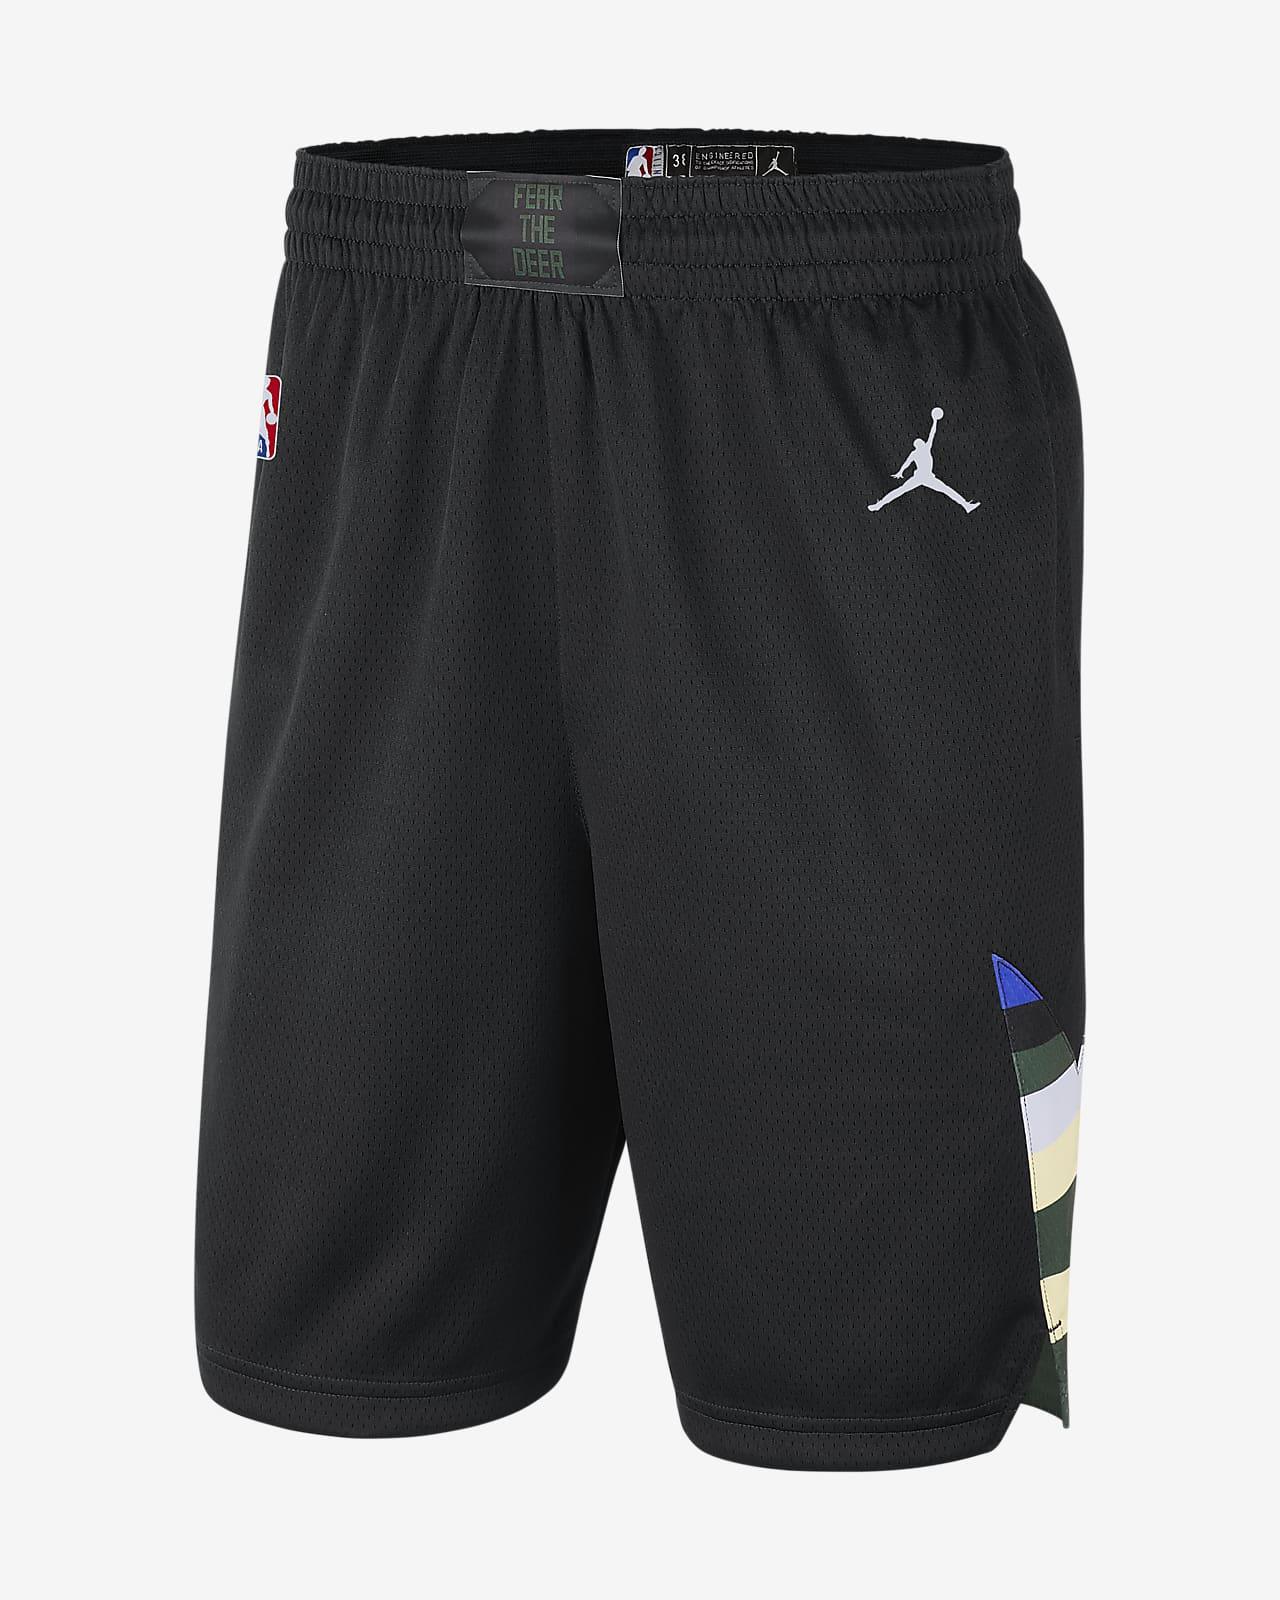 Bucks Statement Edition 2020 Men's Jordan NBA Swingman Shorts